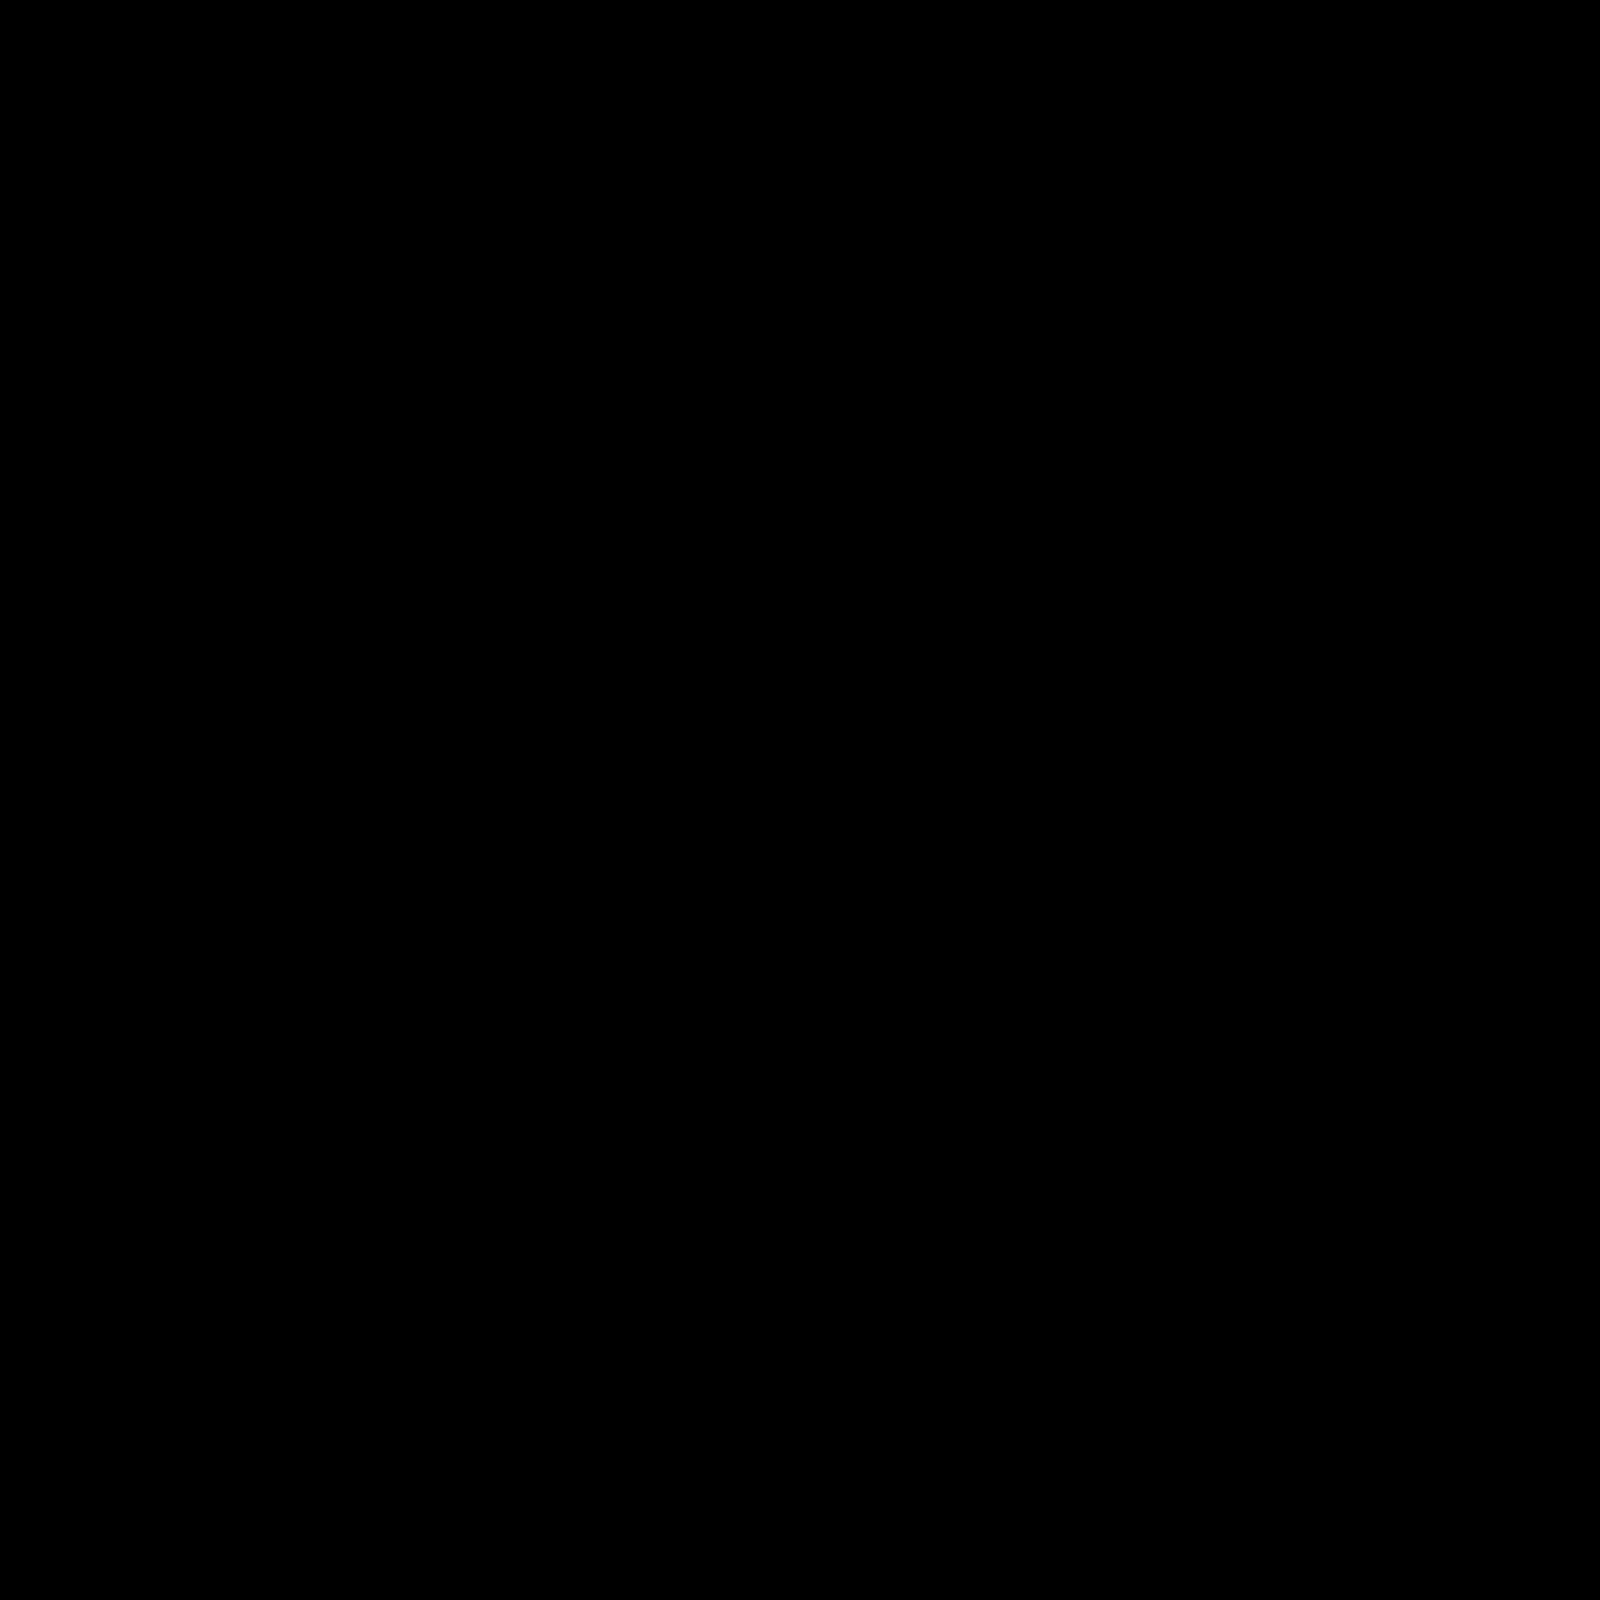 Ski Vehicle icon